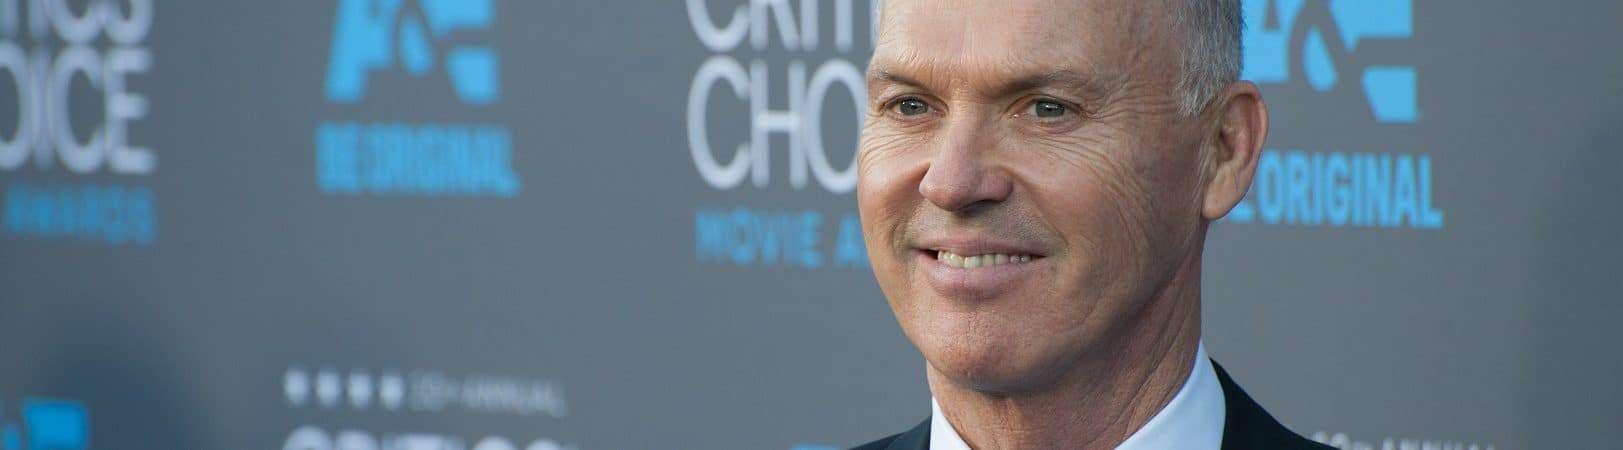 Michael Keaton na 20ª edição do Critics' Choice Movie Awards. Imagem: Featureflash Photo Agency/Shutterstock